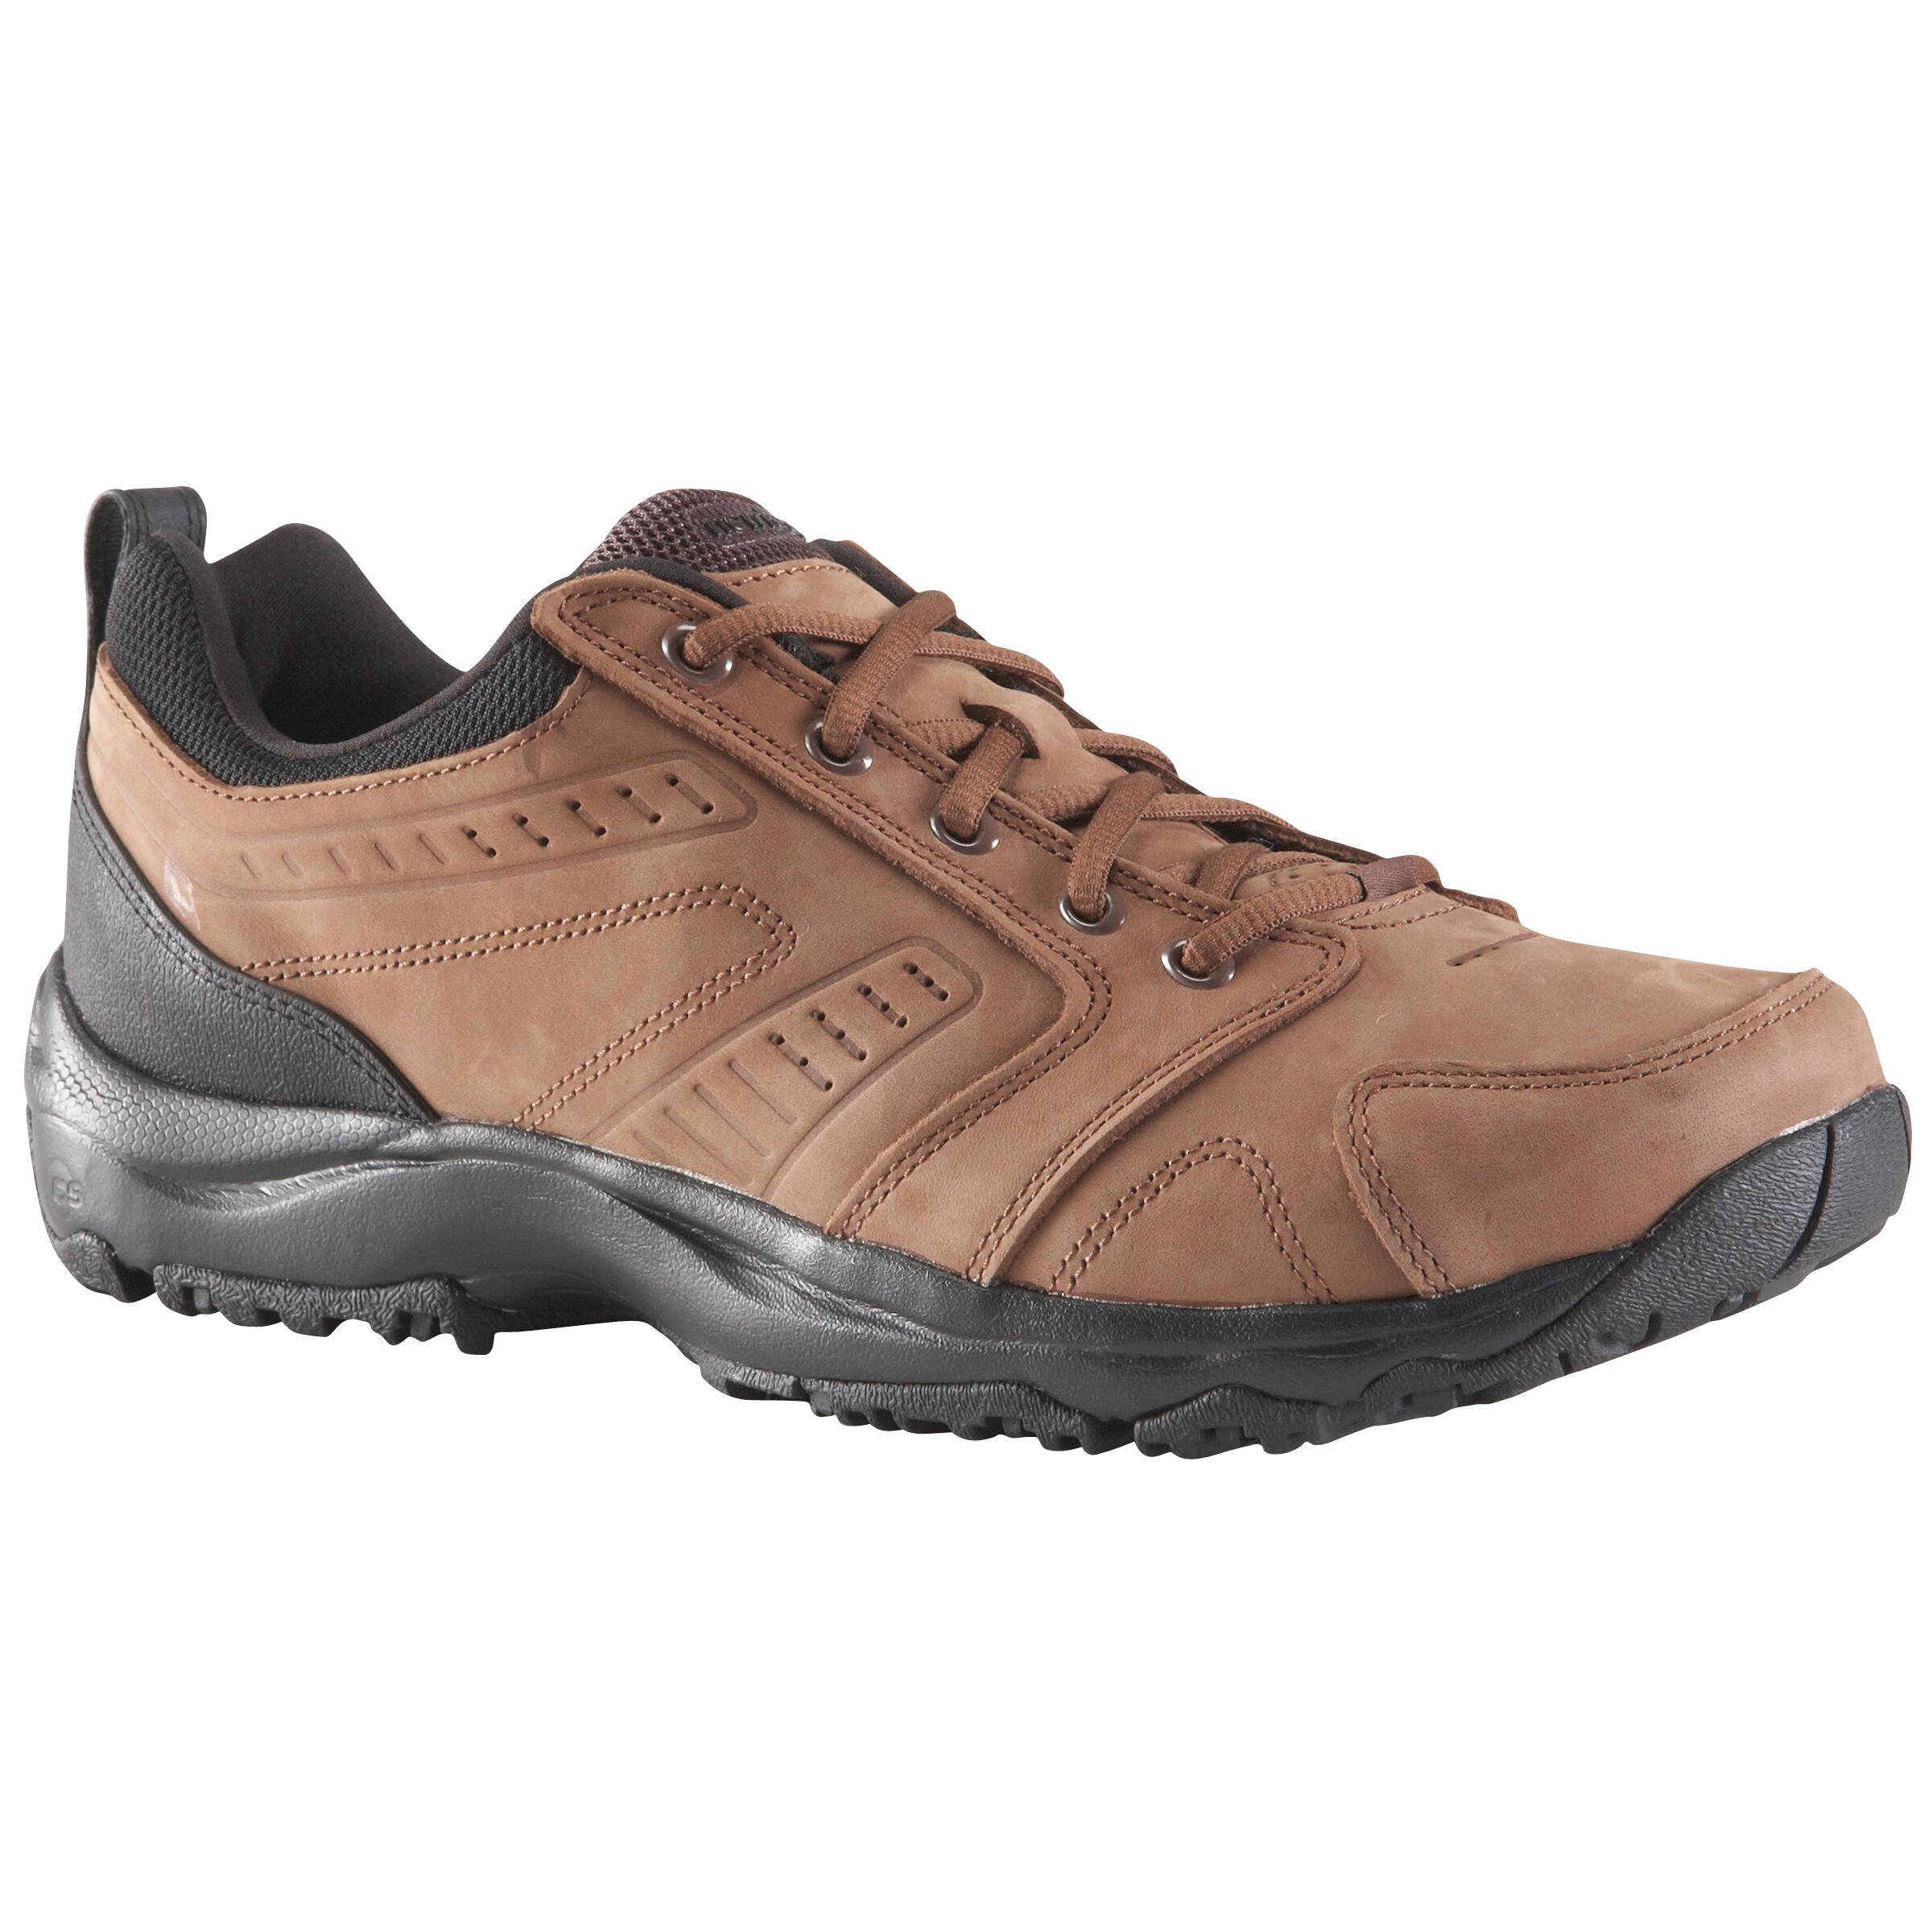 Walkingschuhe Nakuru Komfort Herren   Schuhe > Sportschuhe > Walkingschuhe   Newfeel